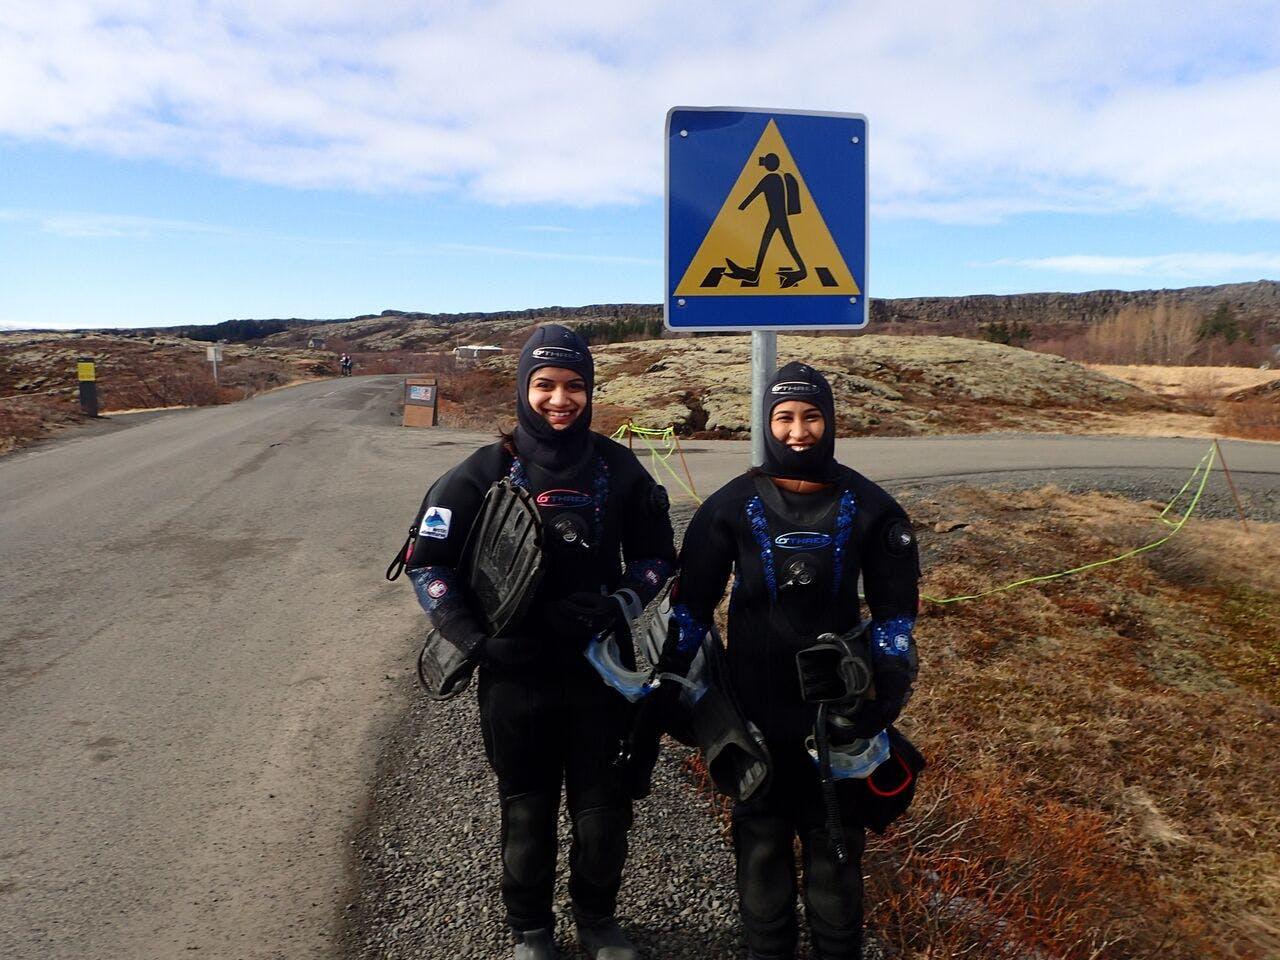 Small Group Silfra Snorkelling Tour From Reykjavík